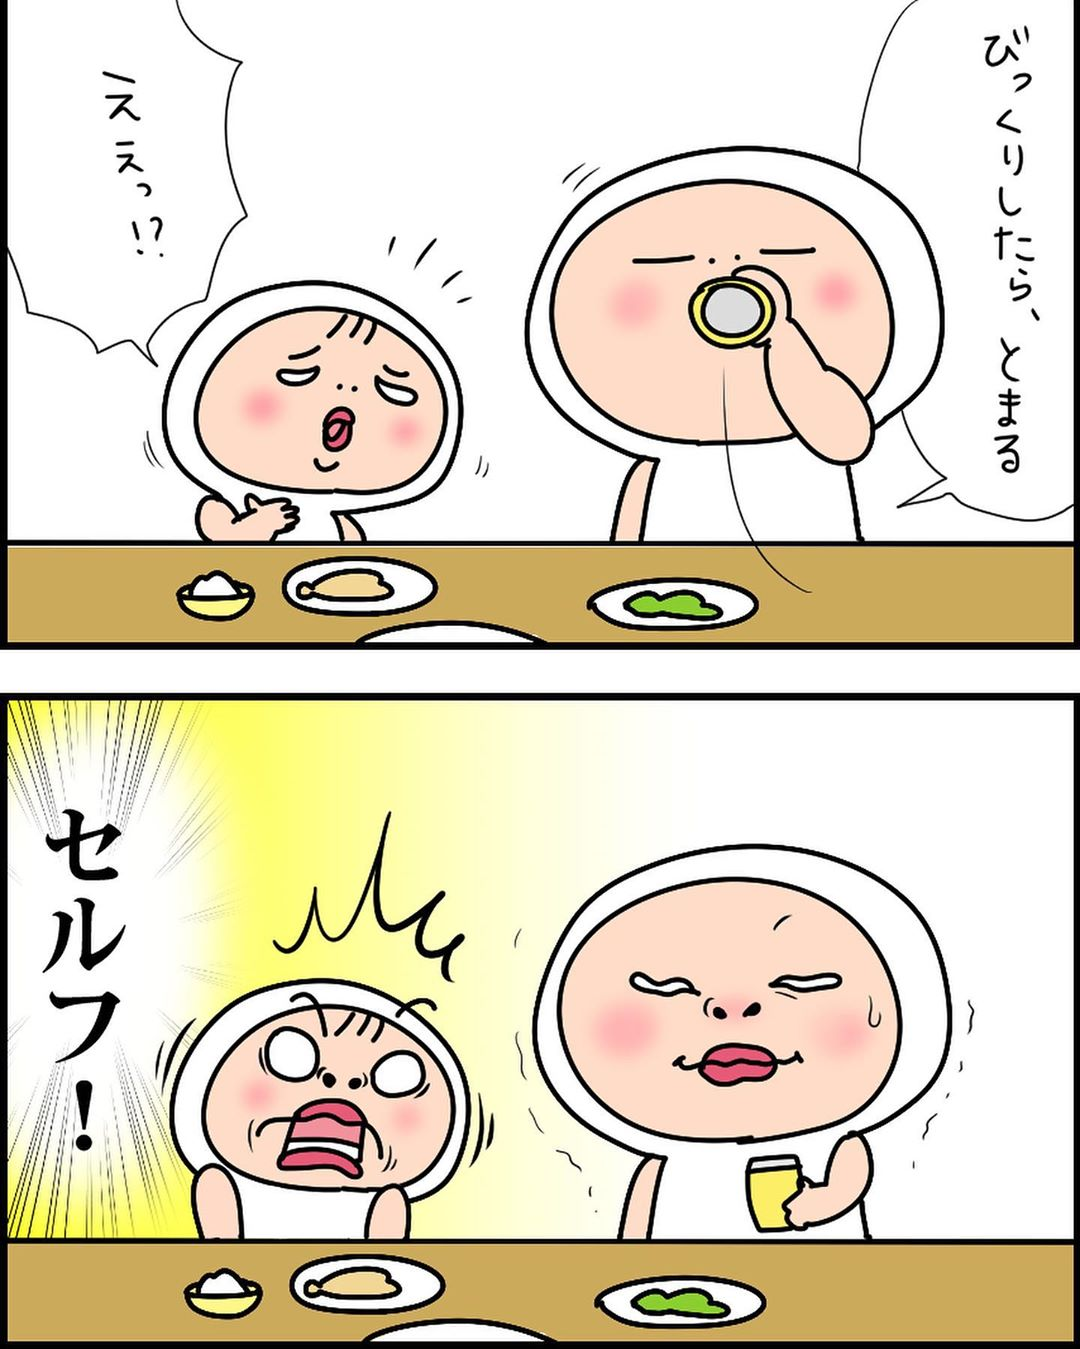 nikunohi029_65311234_336613513921160_7794529210894833908_n